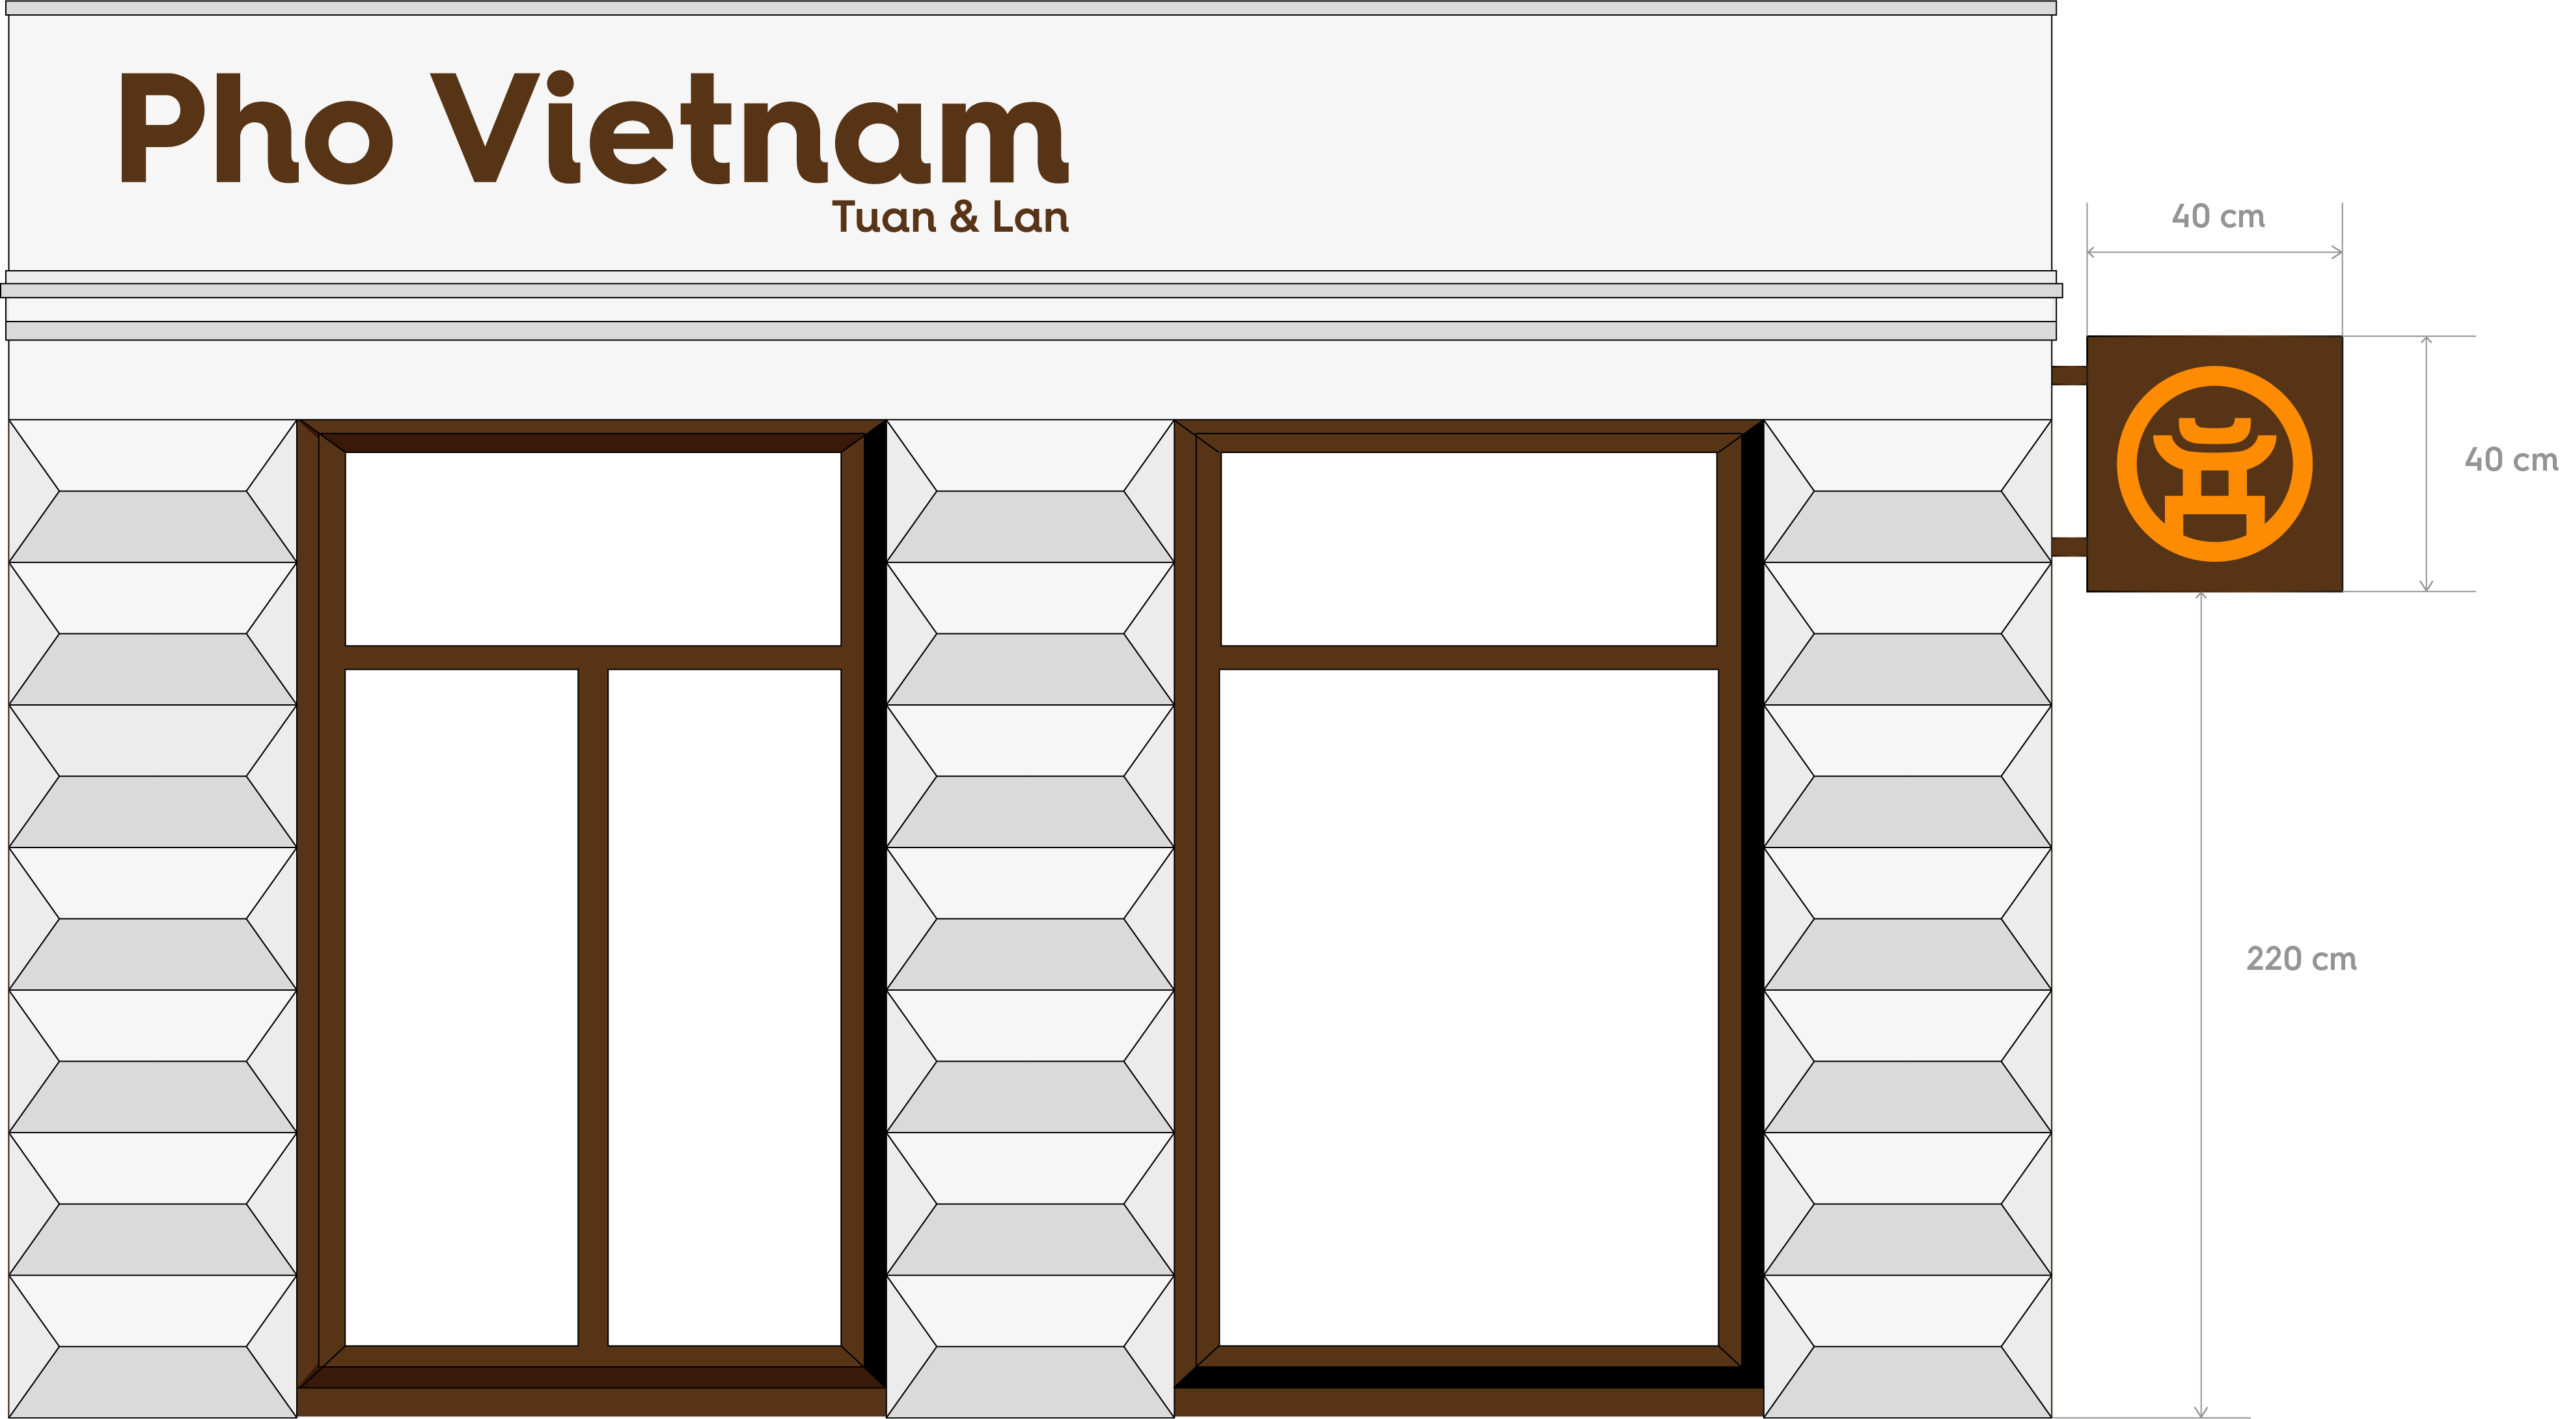 Pho_Vietnam_Tuan_Lan_Praha_design_shop_Veronika_Rut_Novakova